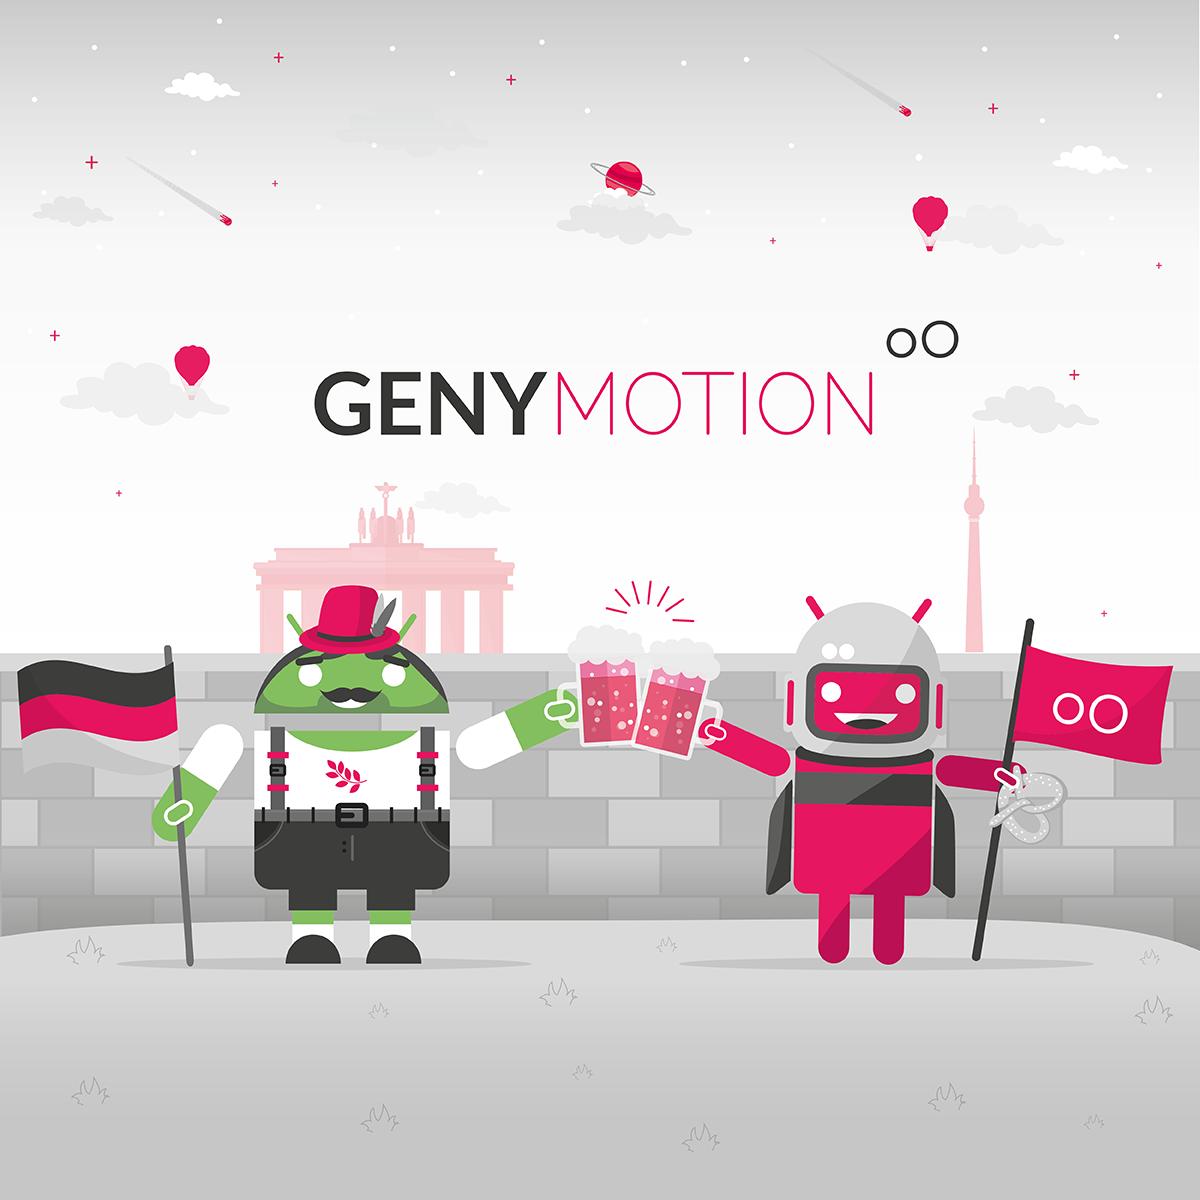 genymotion-droidcon-berlin-2015